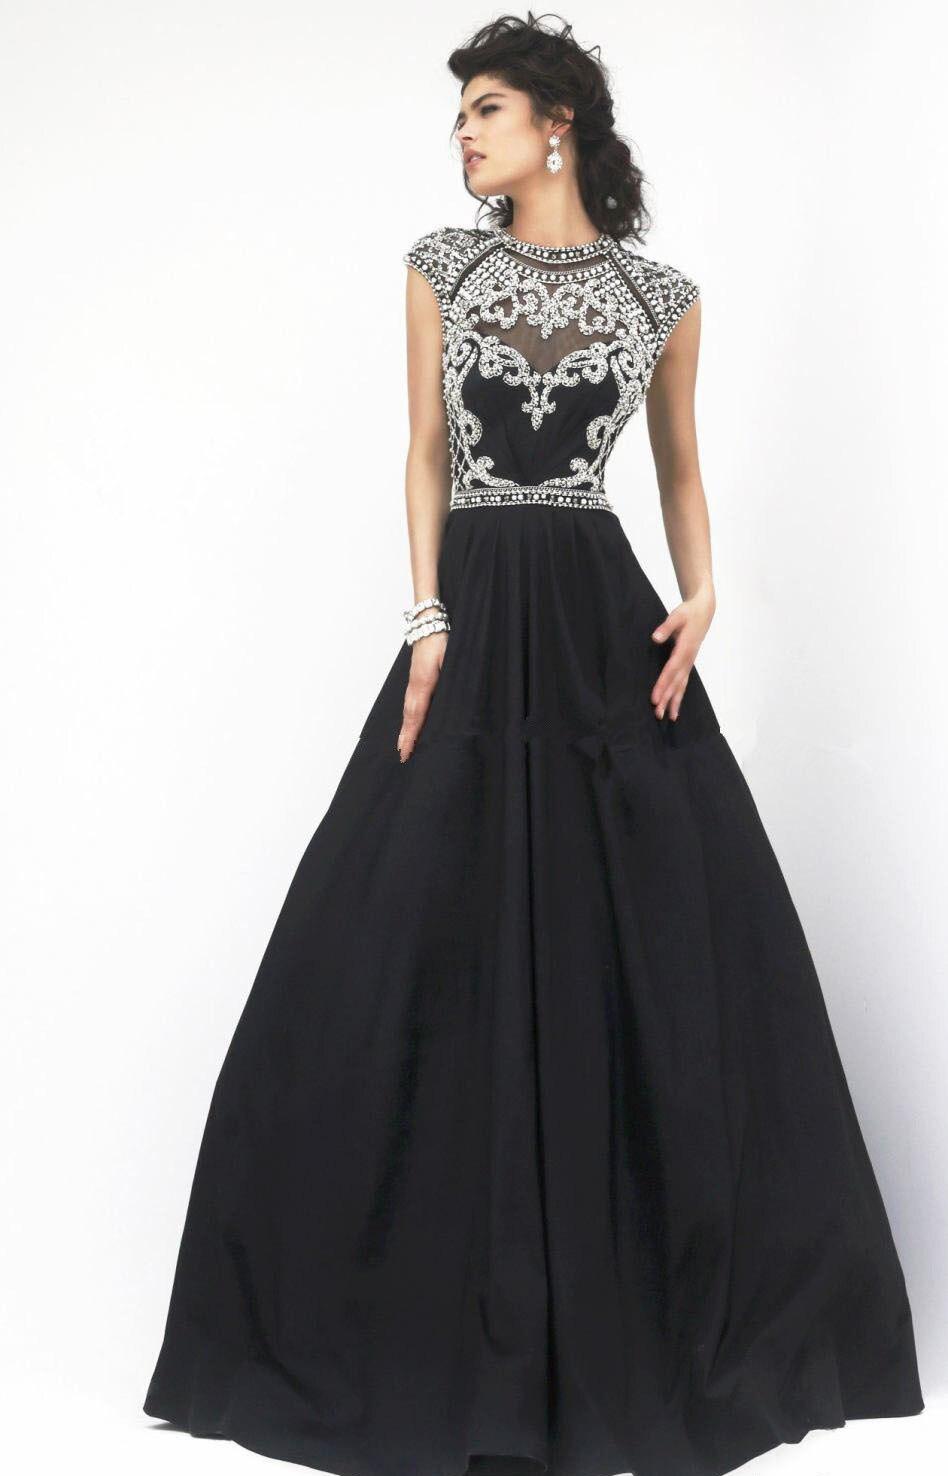 2014 Fashion Taffeta Short Sleeve Prom Dress High Neck Elegant ...